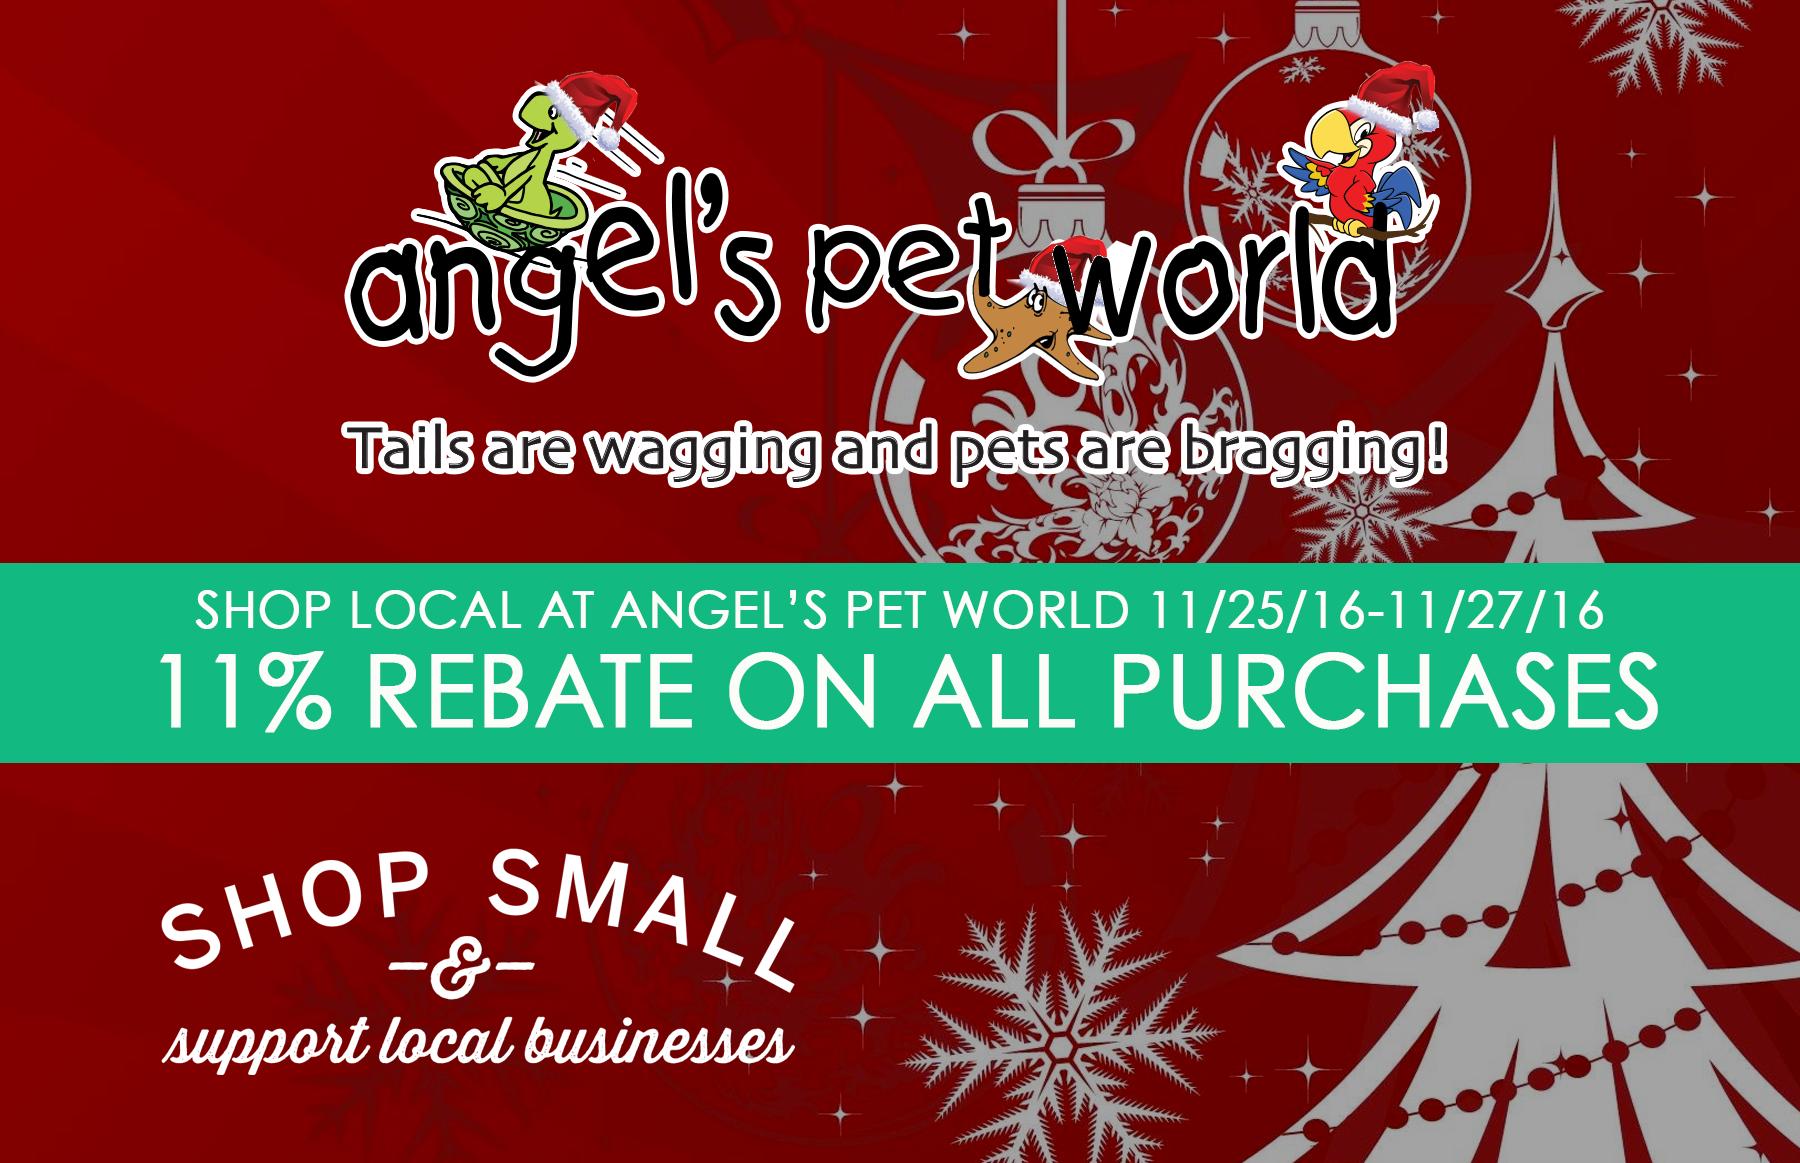 Angels-Rebate-pet-food-pet-supplies-hudson-angels-pet-world